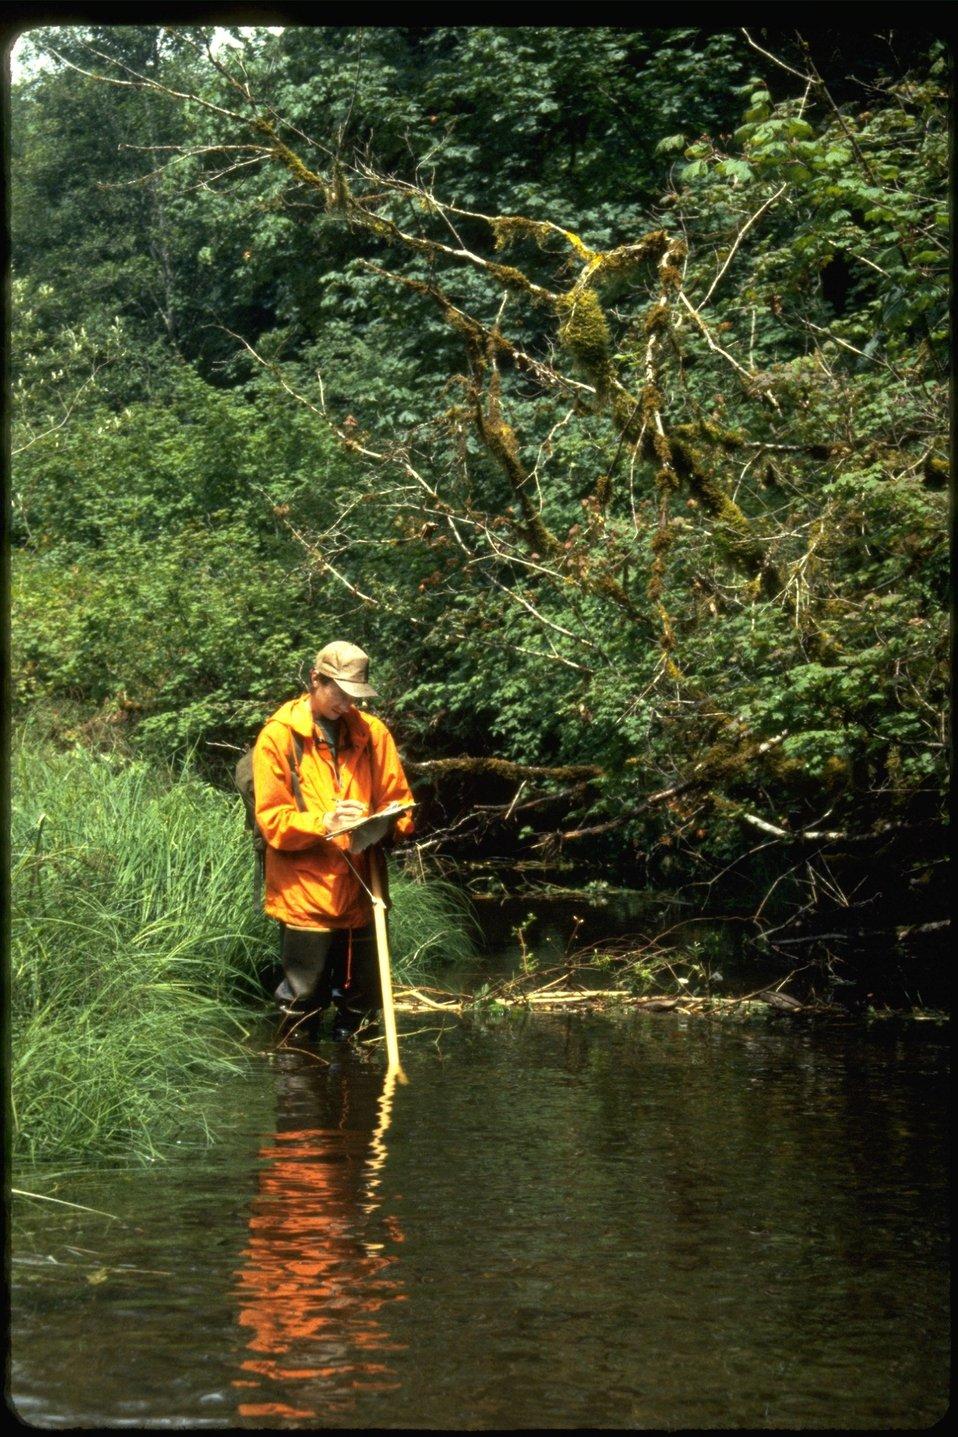 Russ surveying Smith Creek during habitat study.